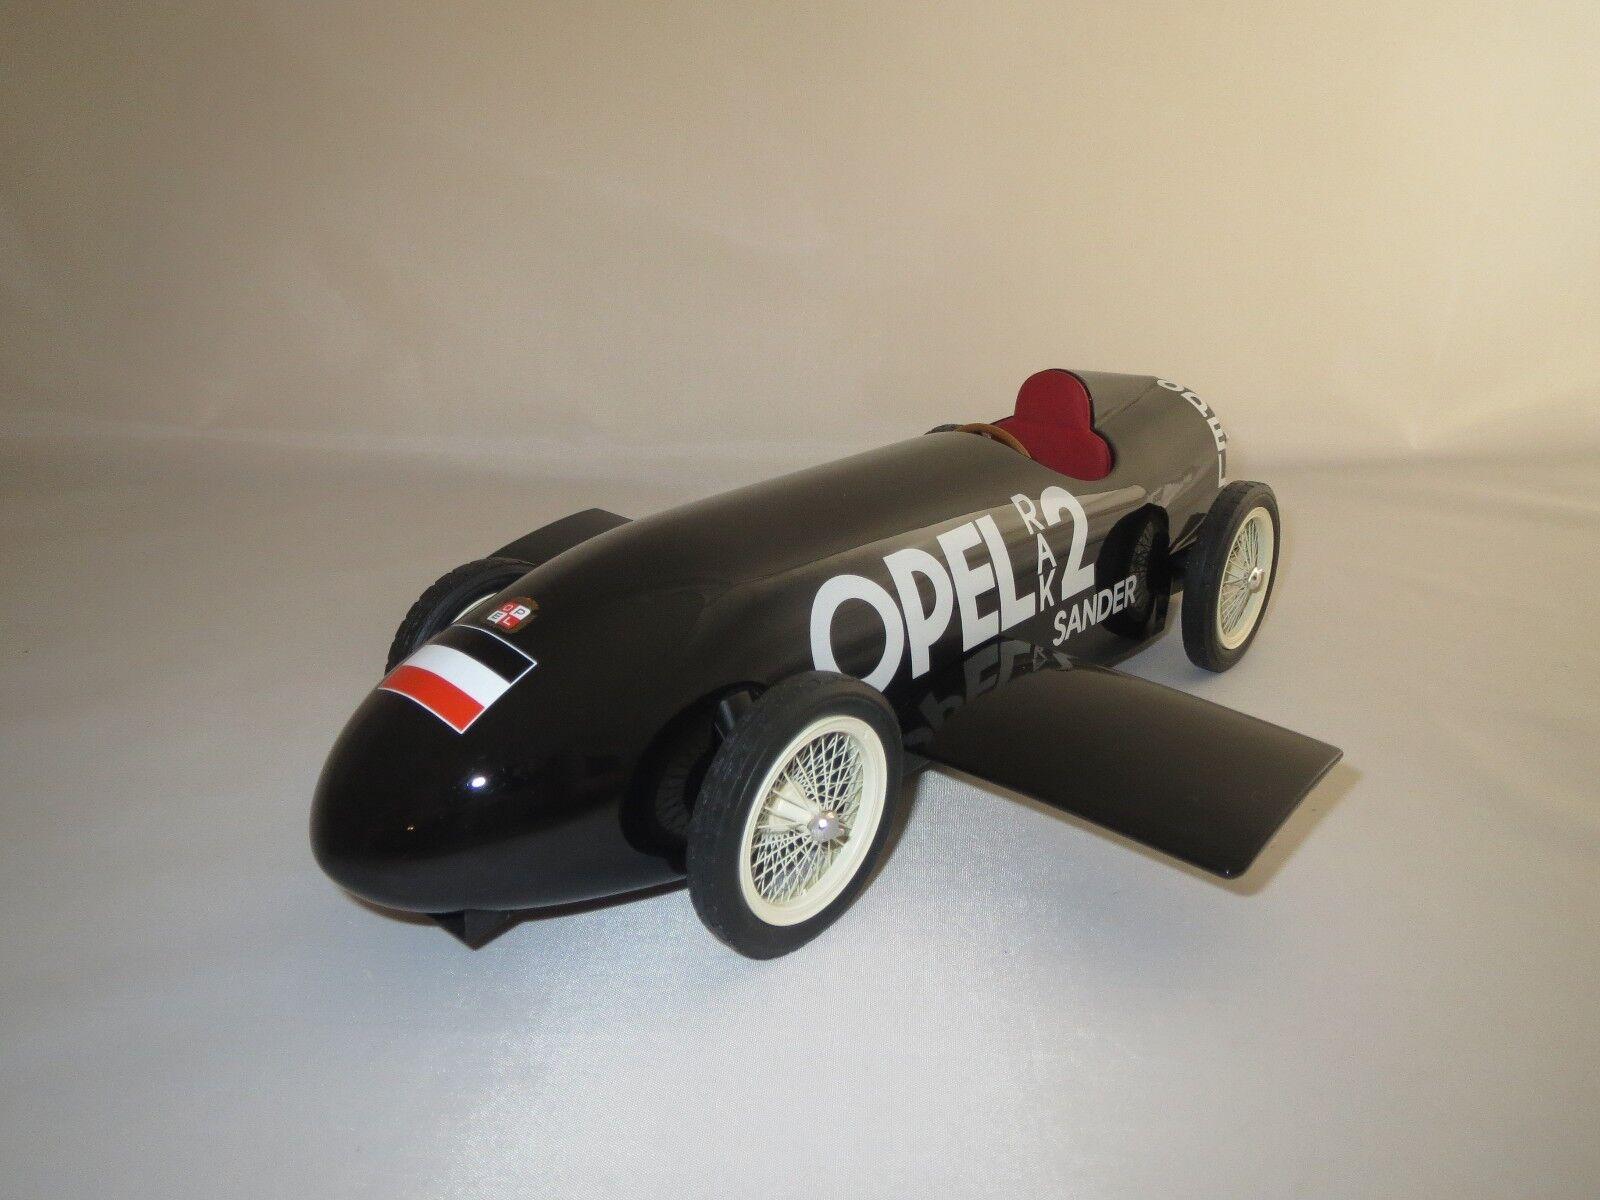 Bos Opel rak 2  1928  (nero) 1 18 sin embalaje